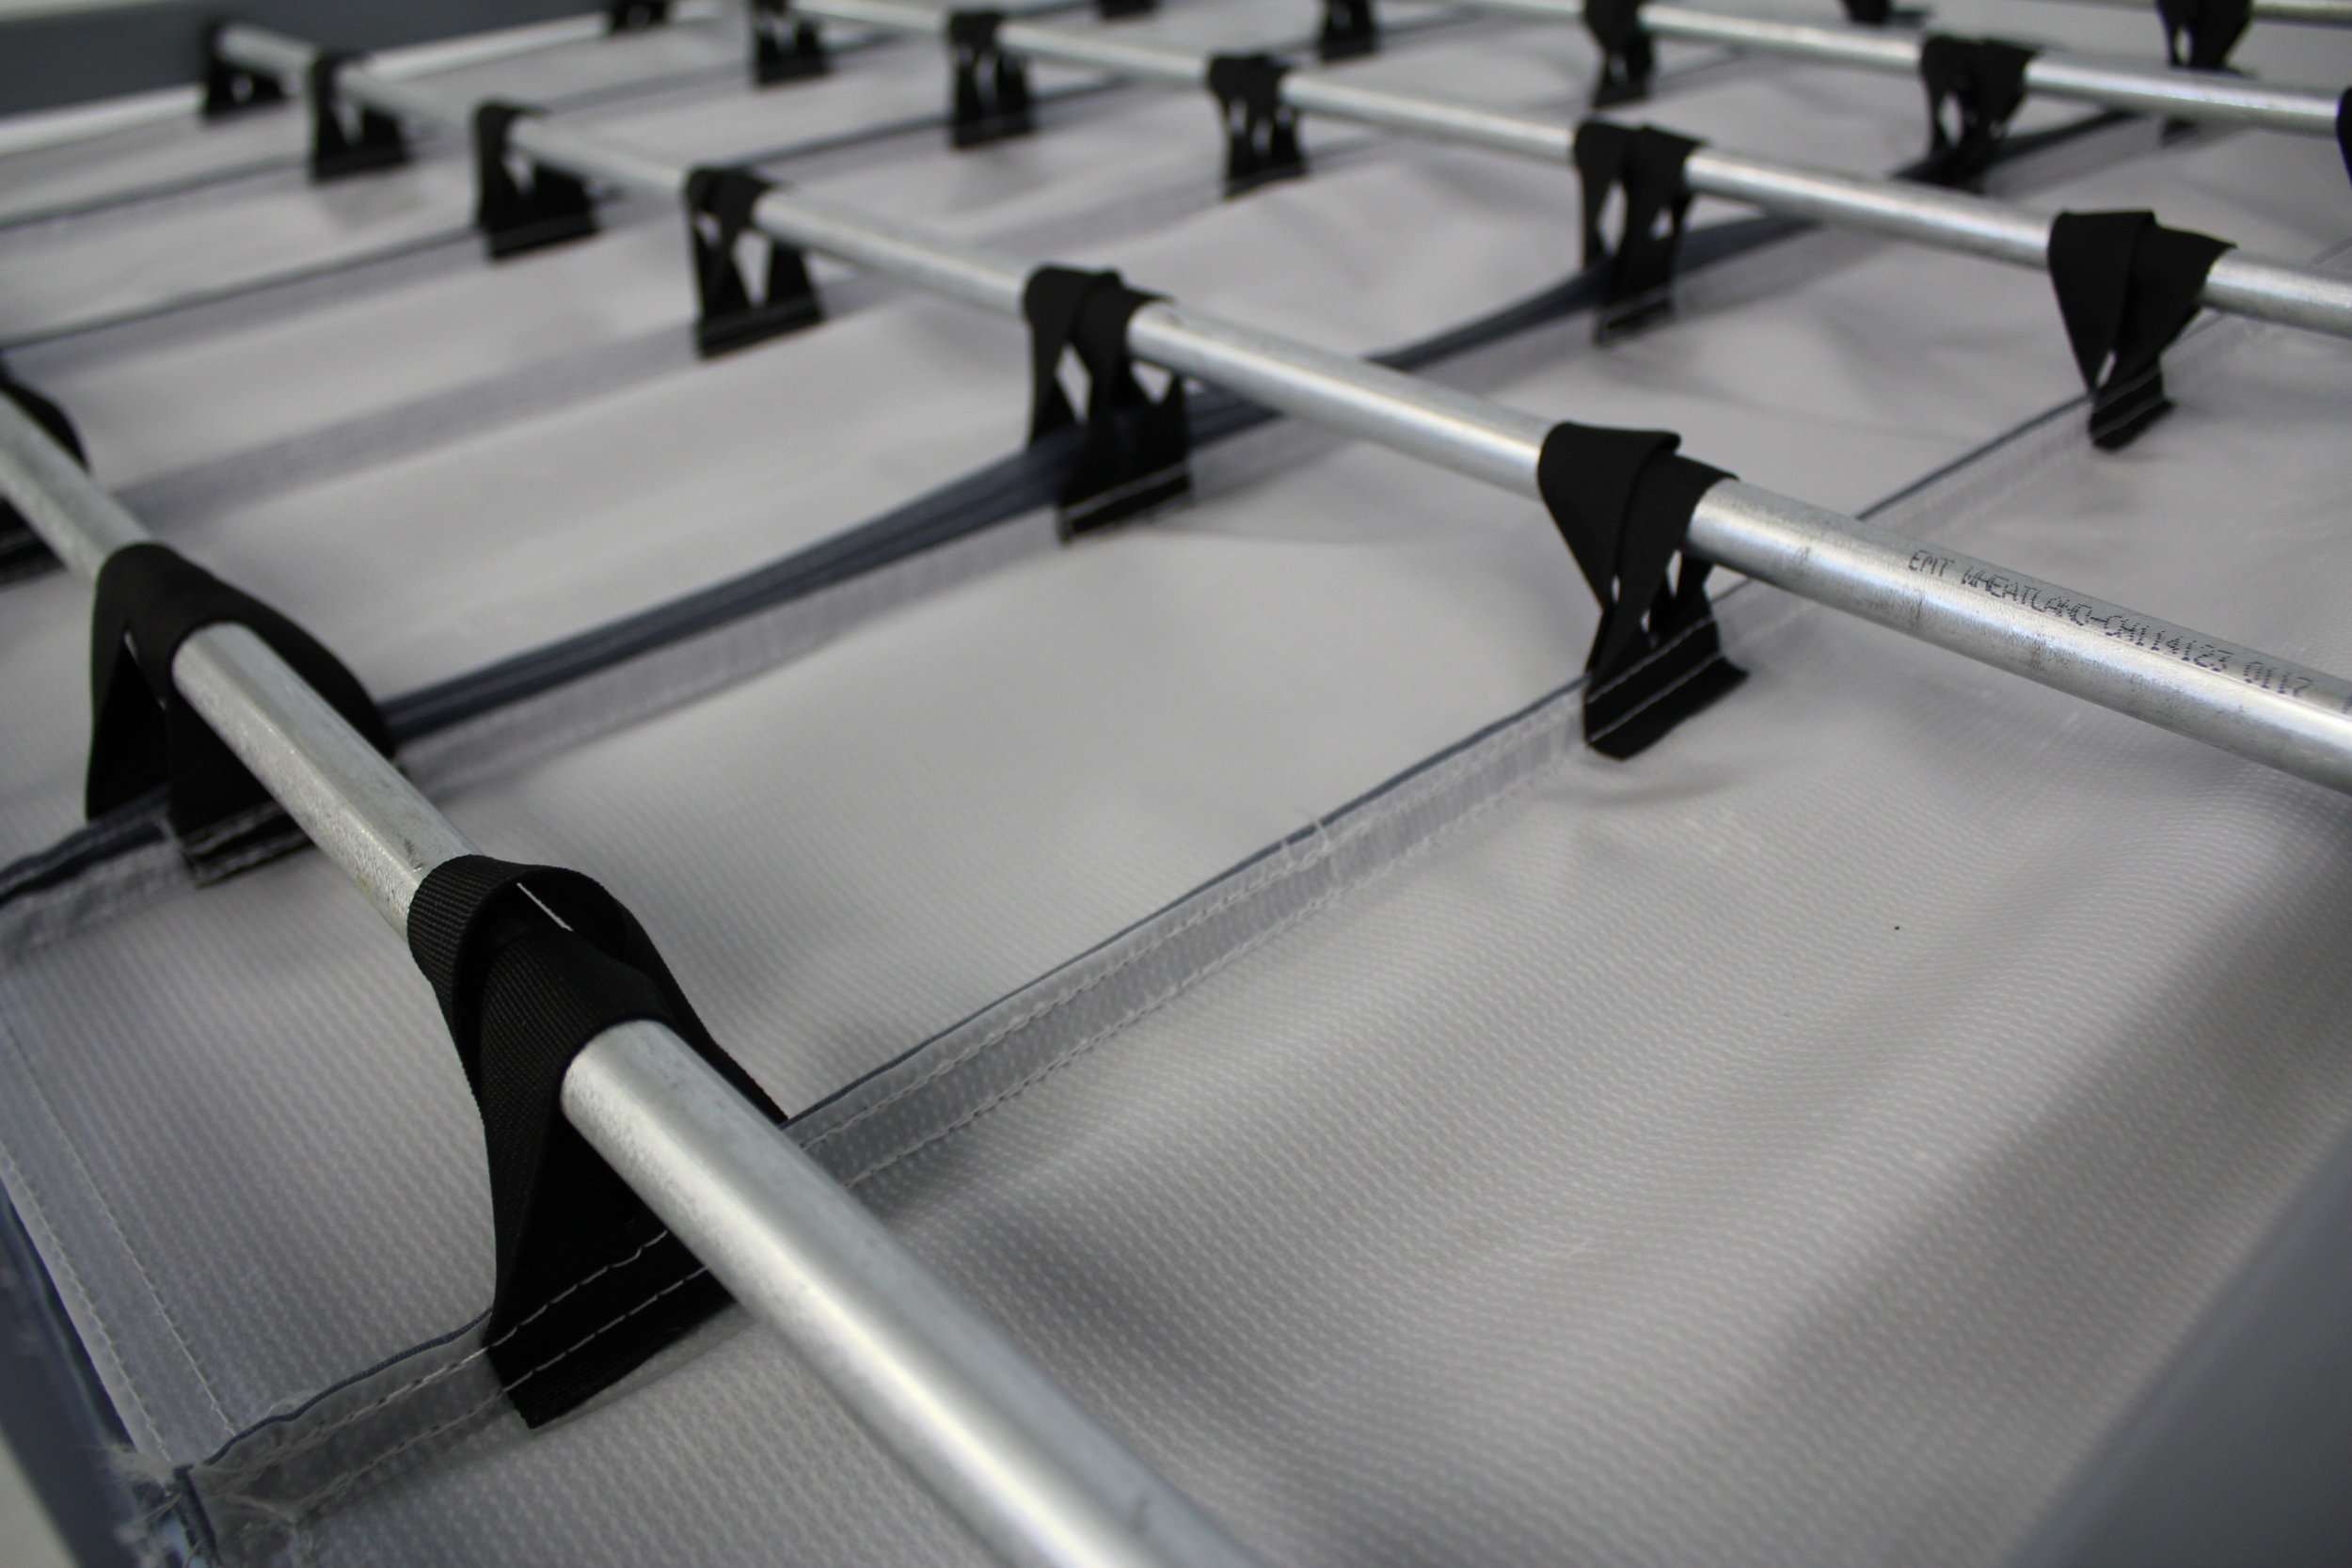 returnable-fabric-packaging-system-rack-020.JPG